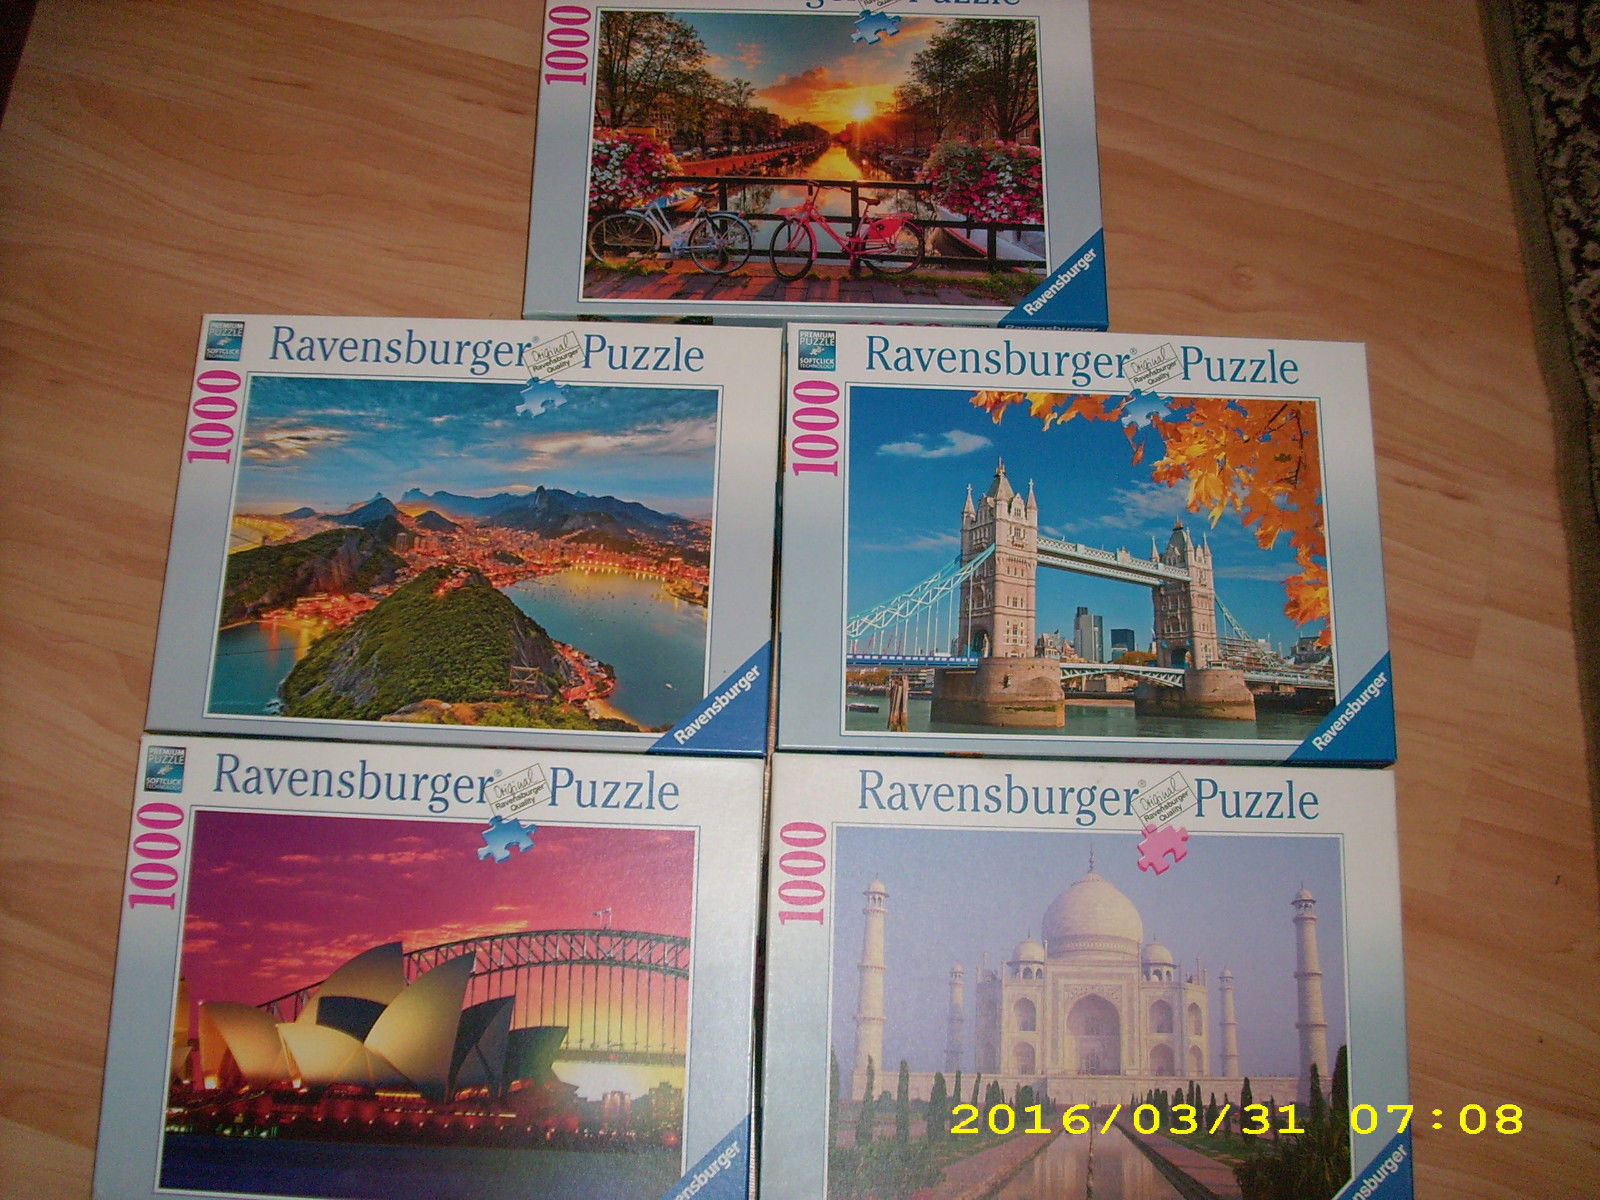 Ravensburger Puzzle Sammlung / Konvolut 1000 Teile